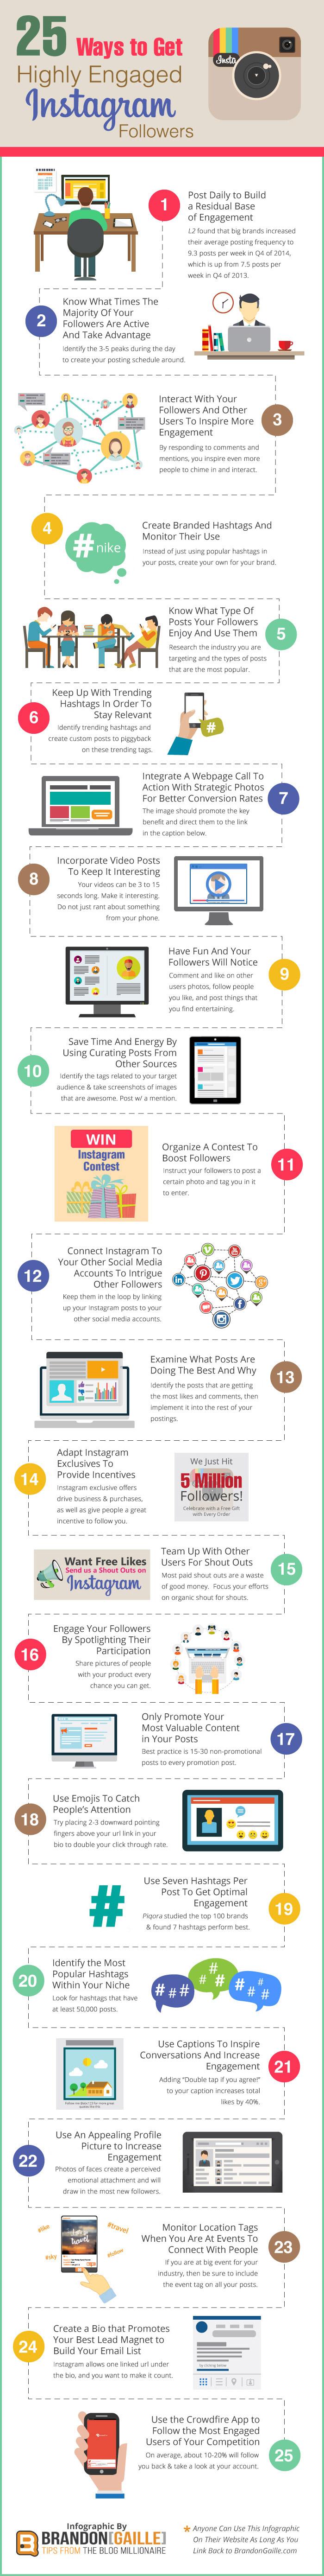 Instagram Marketing Infographic